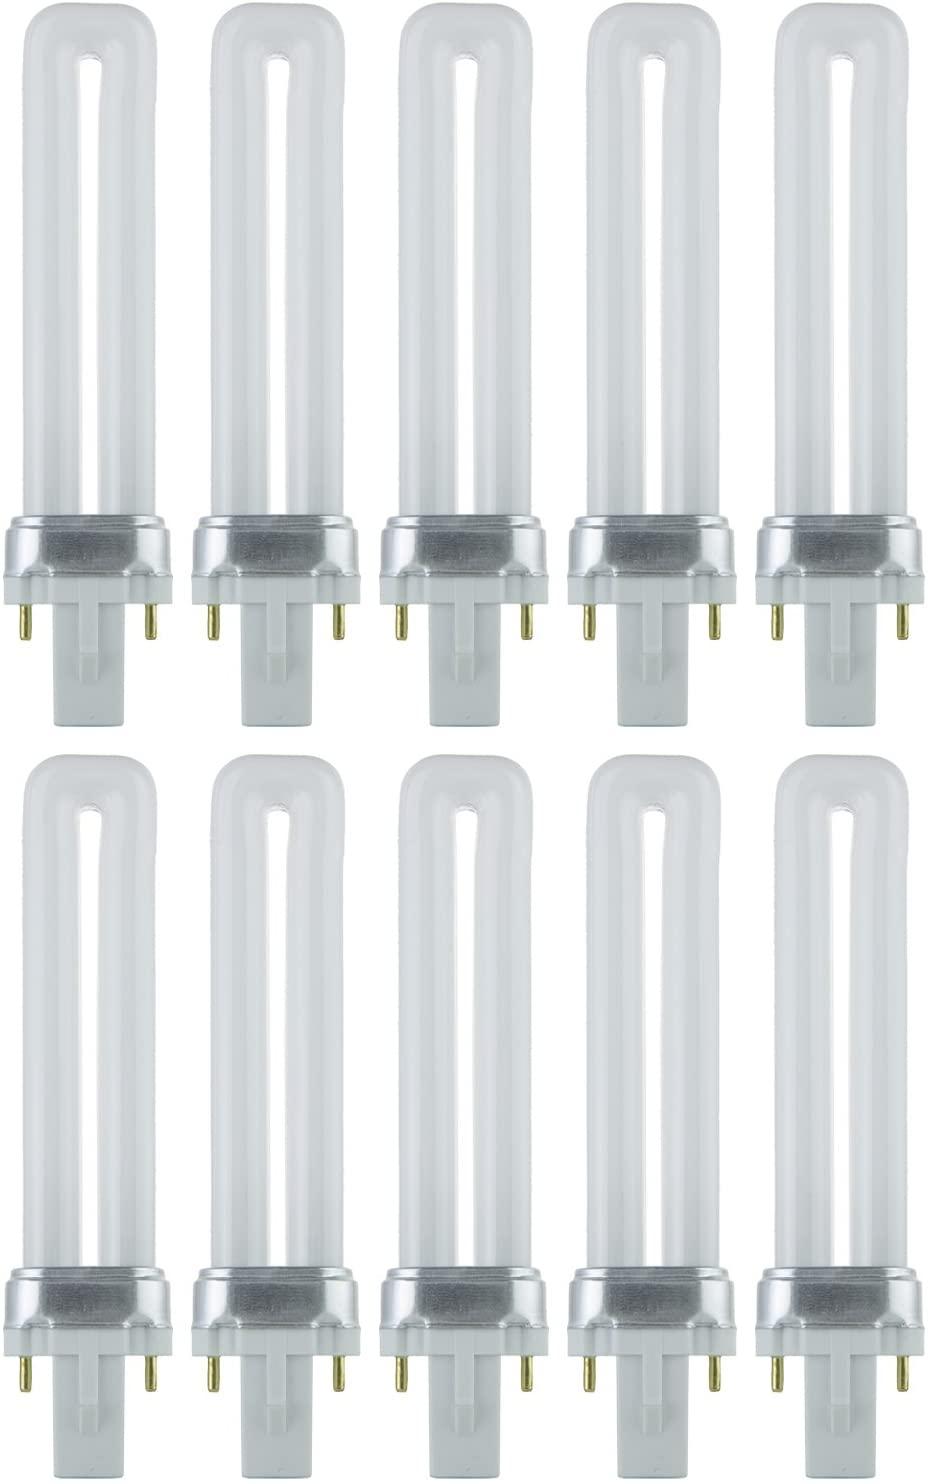 Sunlite PL7/SP35K 10PK 2-Pin Fluorescent 7W 3500K Neutral White U Shaped PL CFL Twin Tube Plugin Light Bulbs with G23 Base (10 Pack)